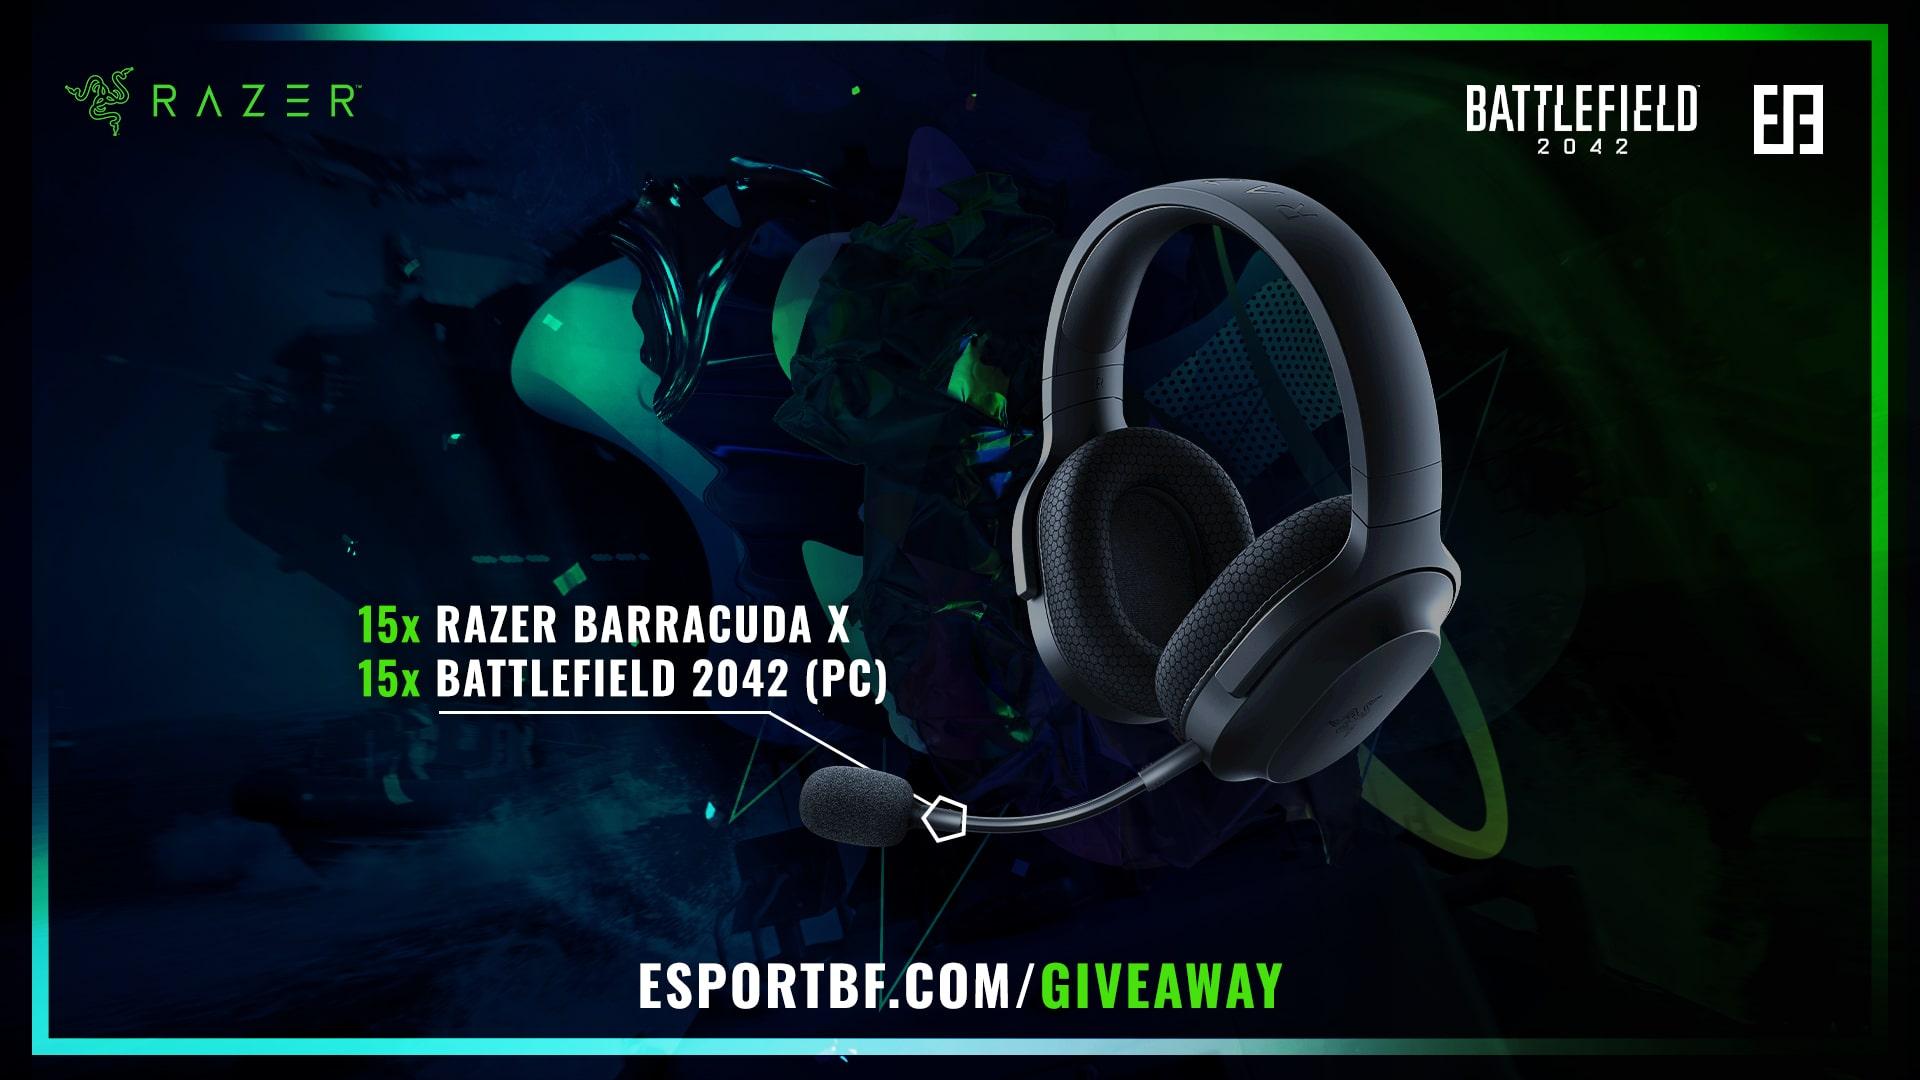 15x Razer Barracuda X Headsets. Razer x ESB - Gear up for Battlefield 2042   Giveaway Giveaway Image